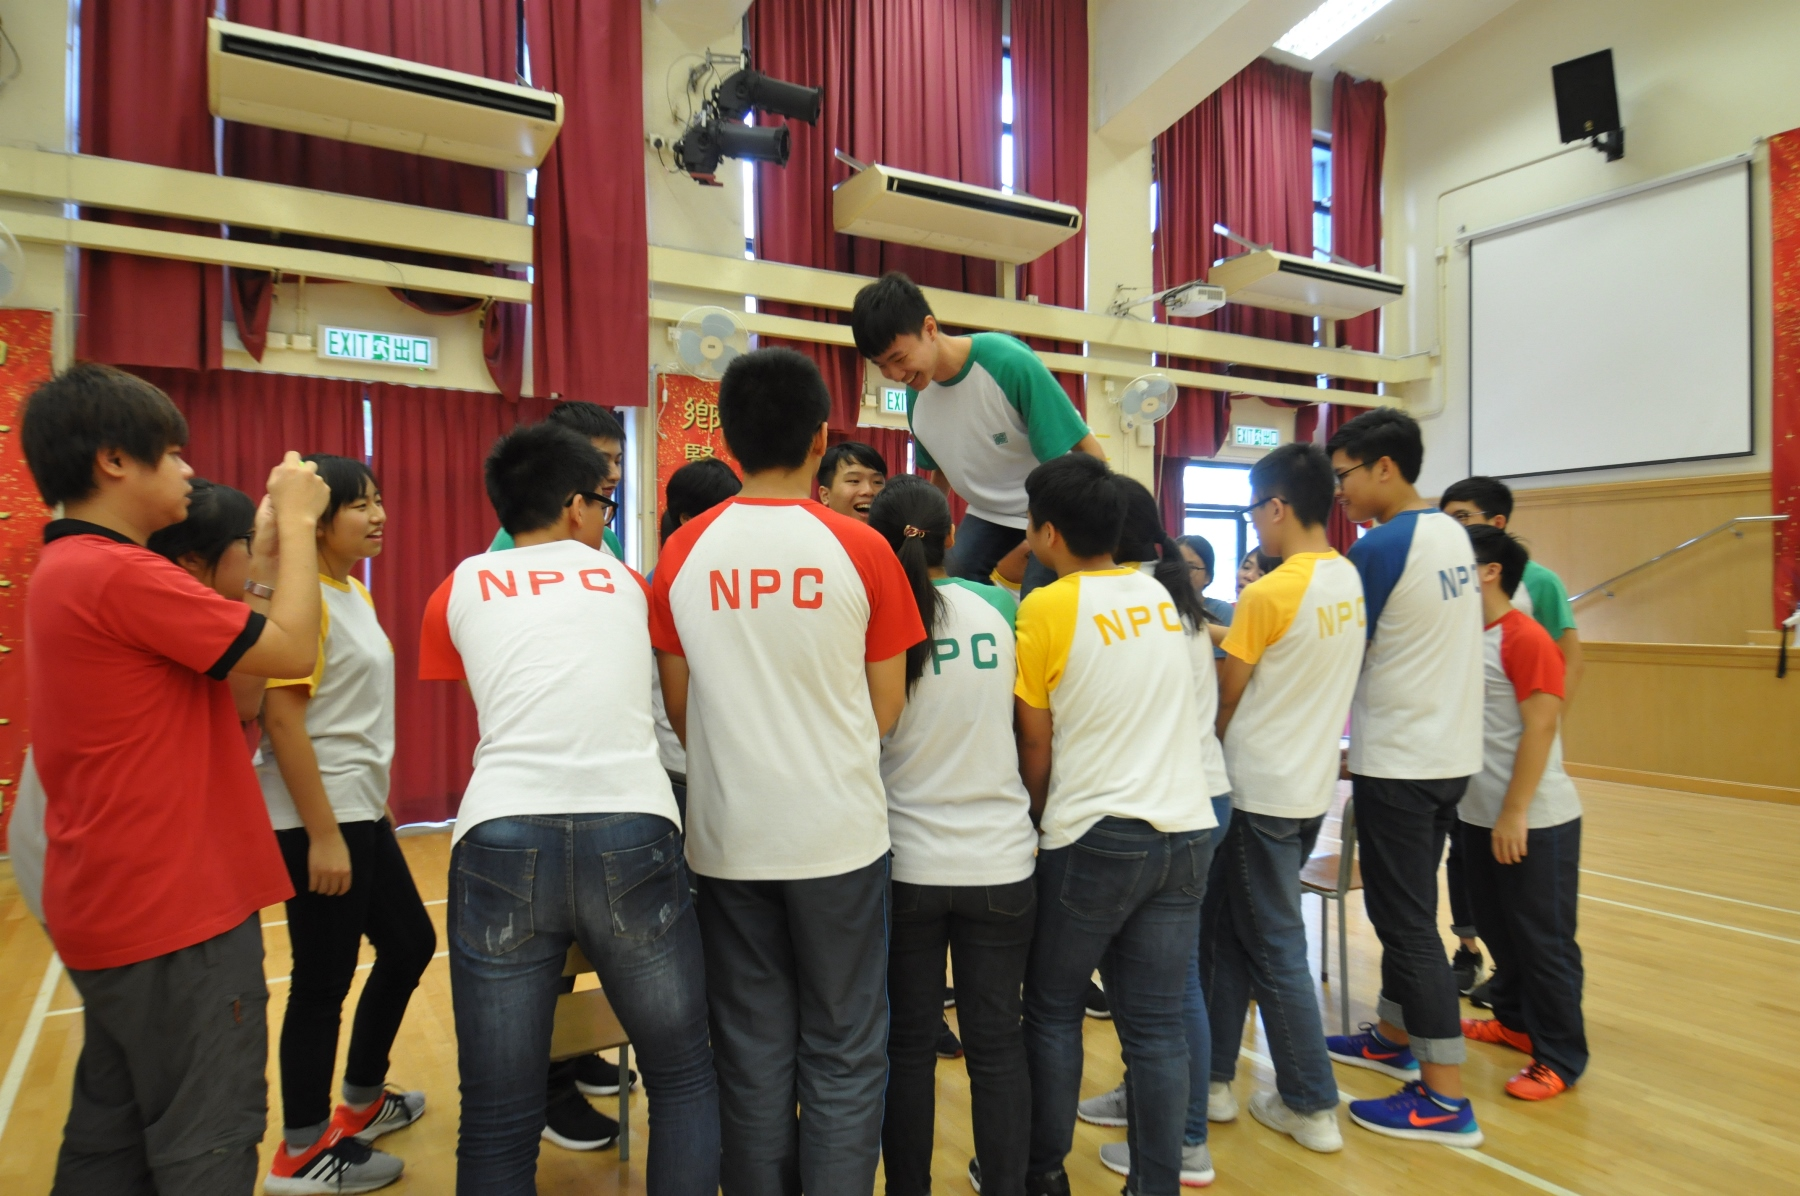 http://www.npc.edu.hk/sites/default/files/dsc_0669.jpg